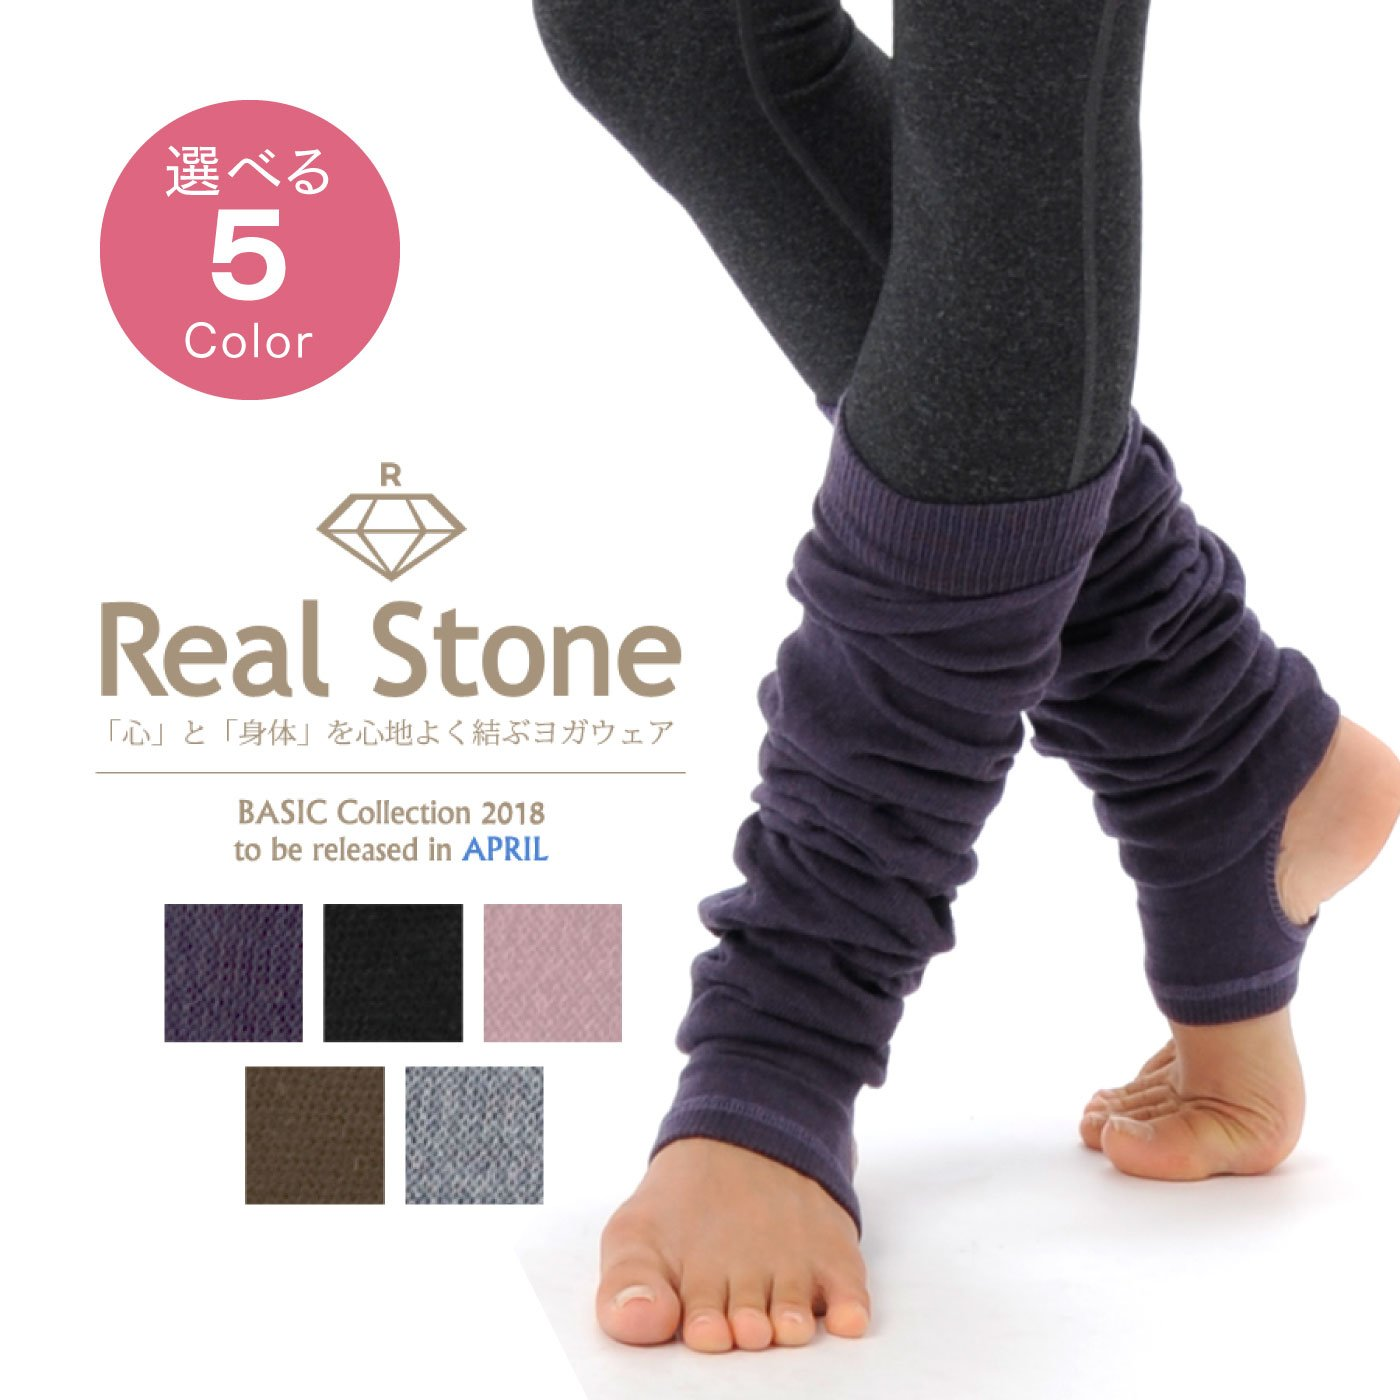 Real Stone トレンカ風ヨガ用ソックス